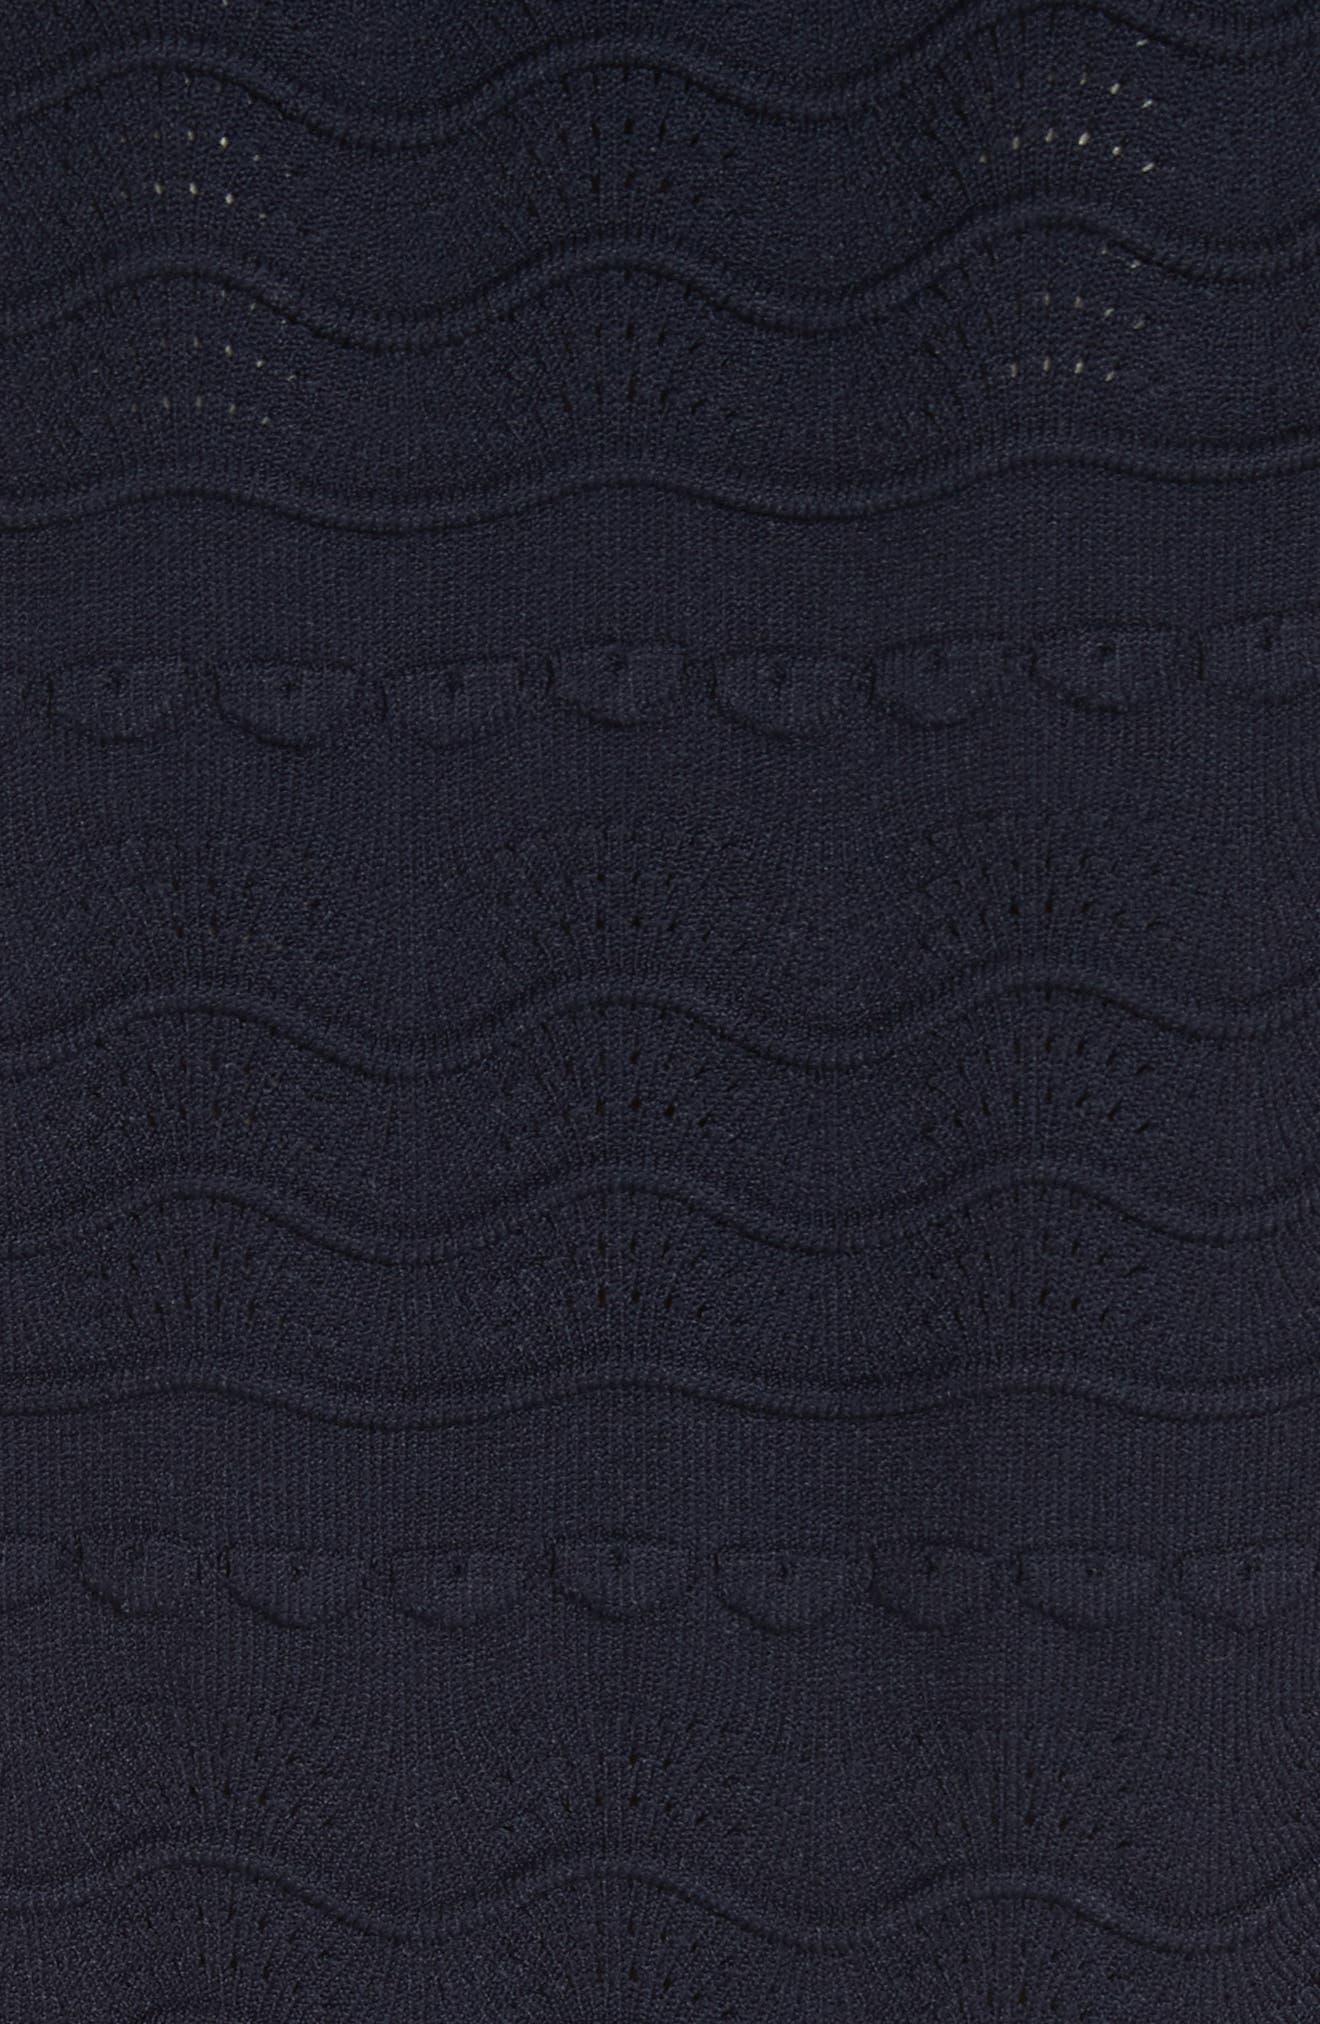 kate spade textured sweater dress,                             Alternate thumbnail 5, color,                             473